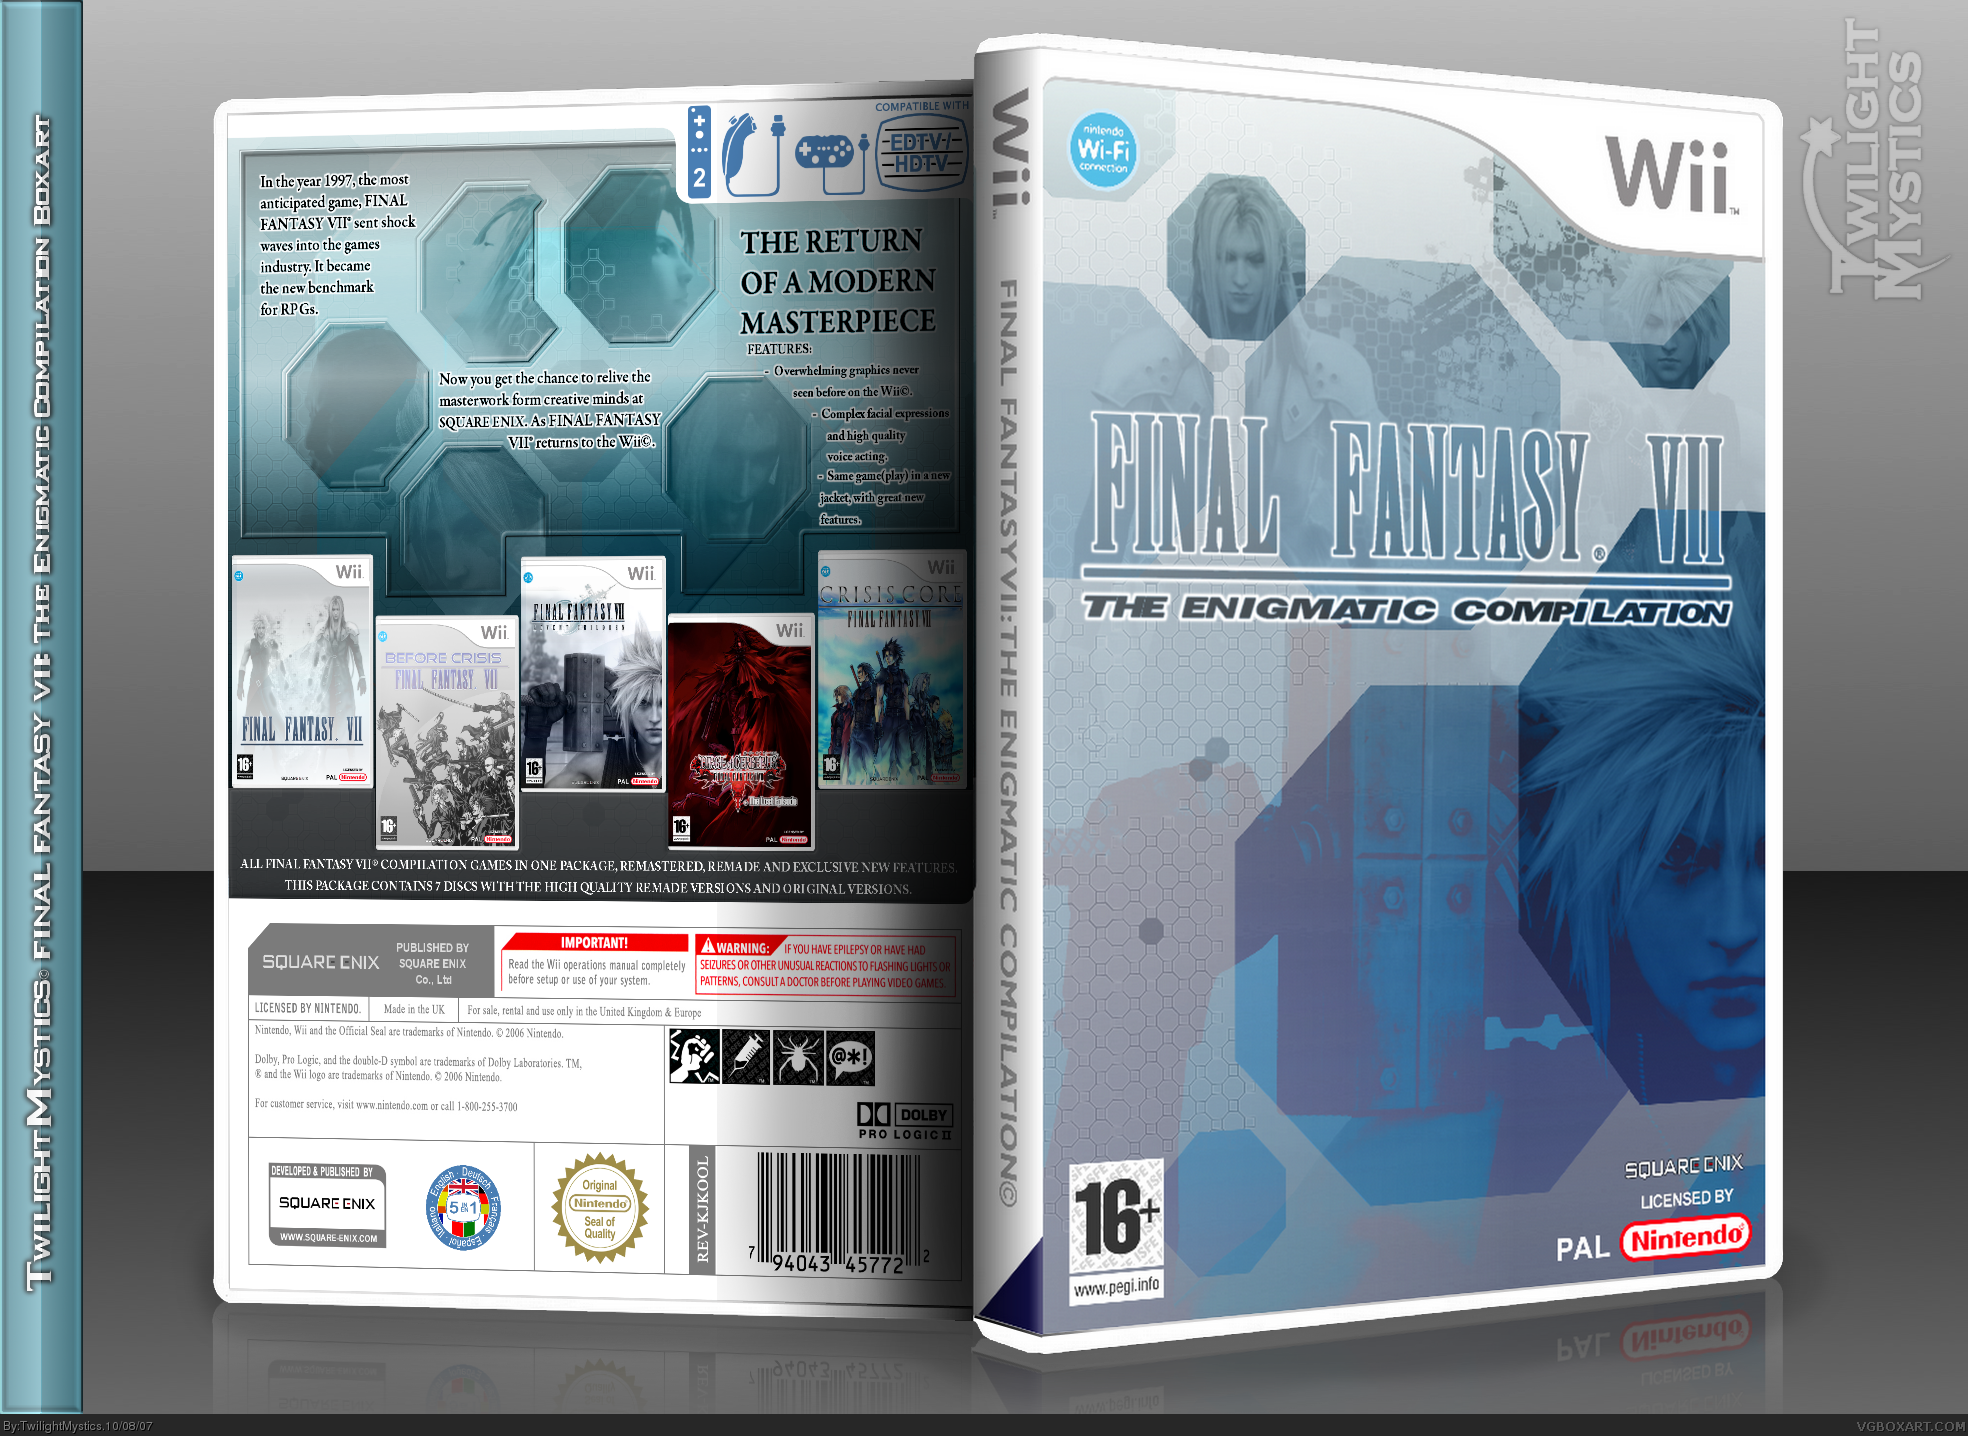 Final Fantasy VII: The Engimat...